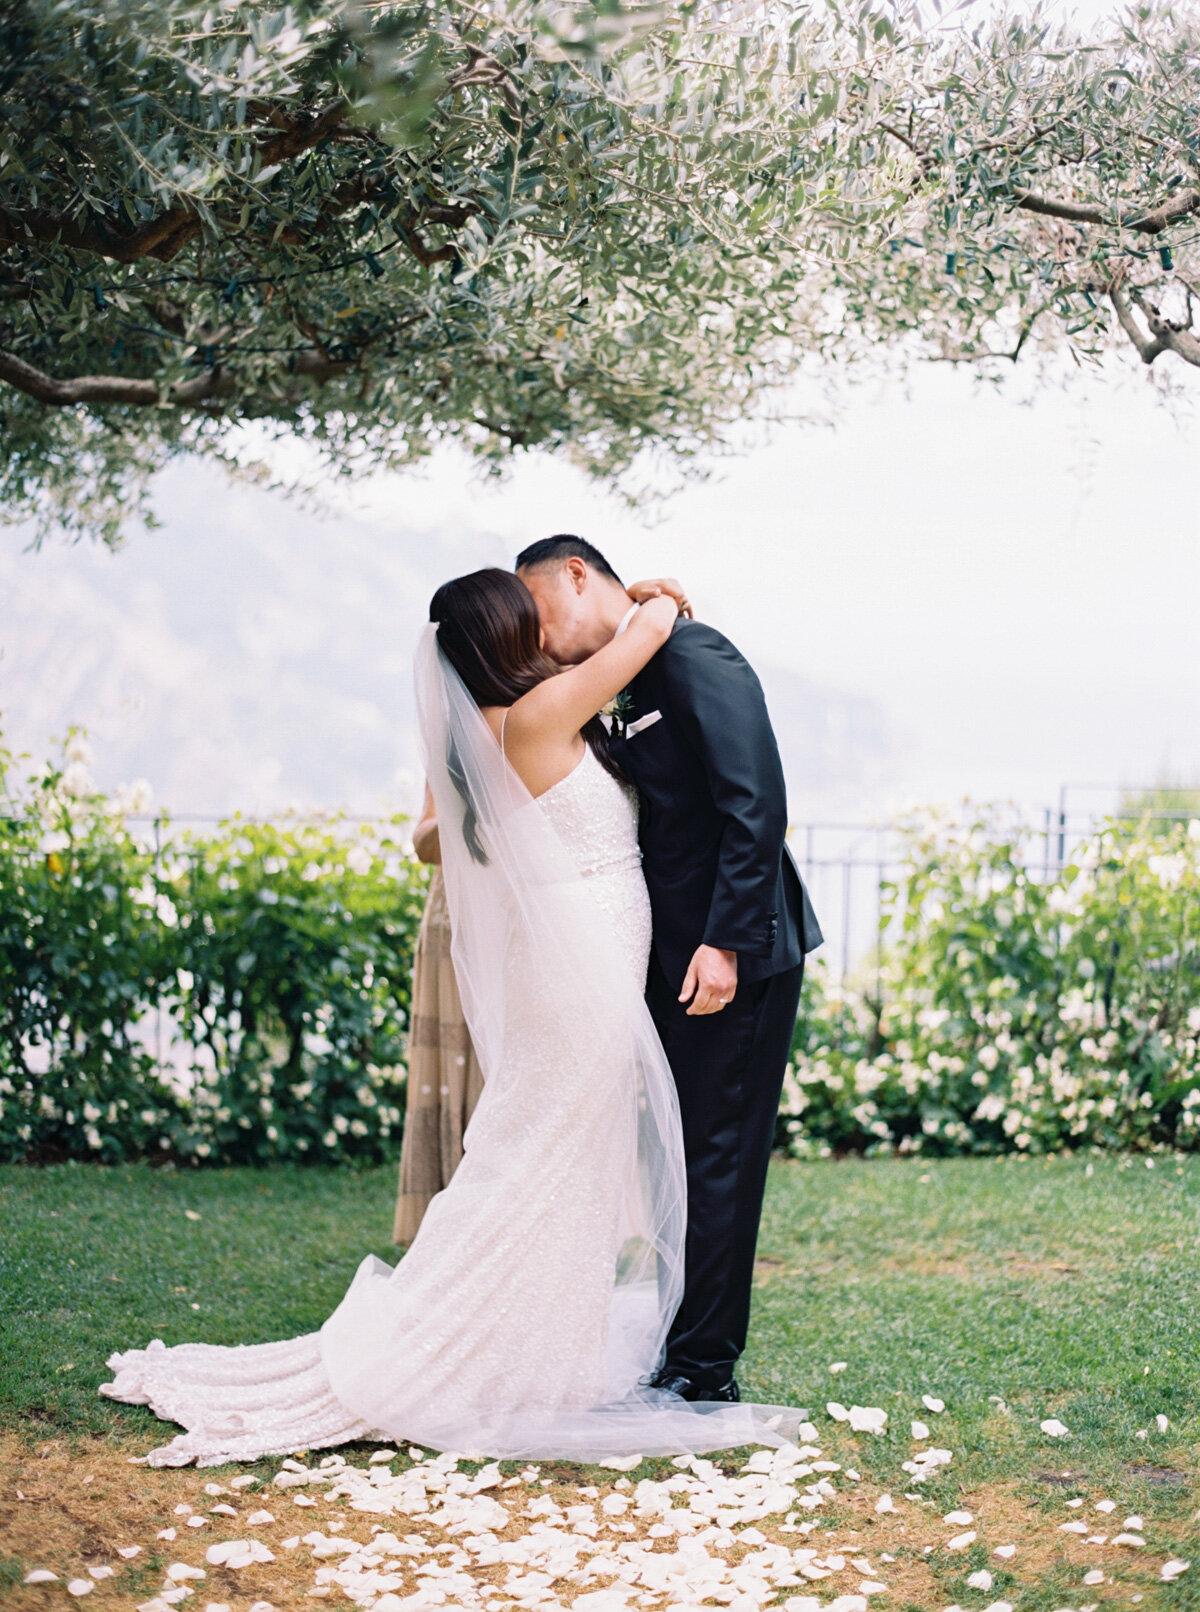 Belmond-Hotel-Caruso-ravello-elopement-Katie-Grant-destination-wedding (29 of 50).jpg